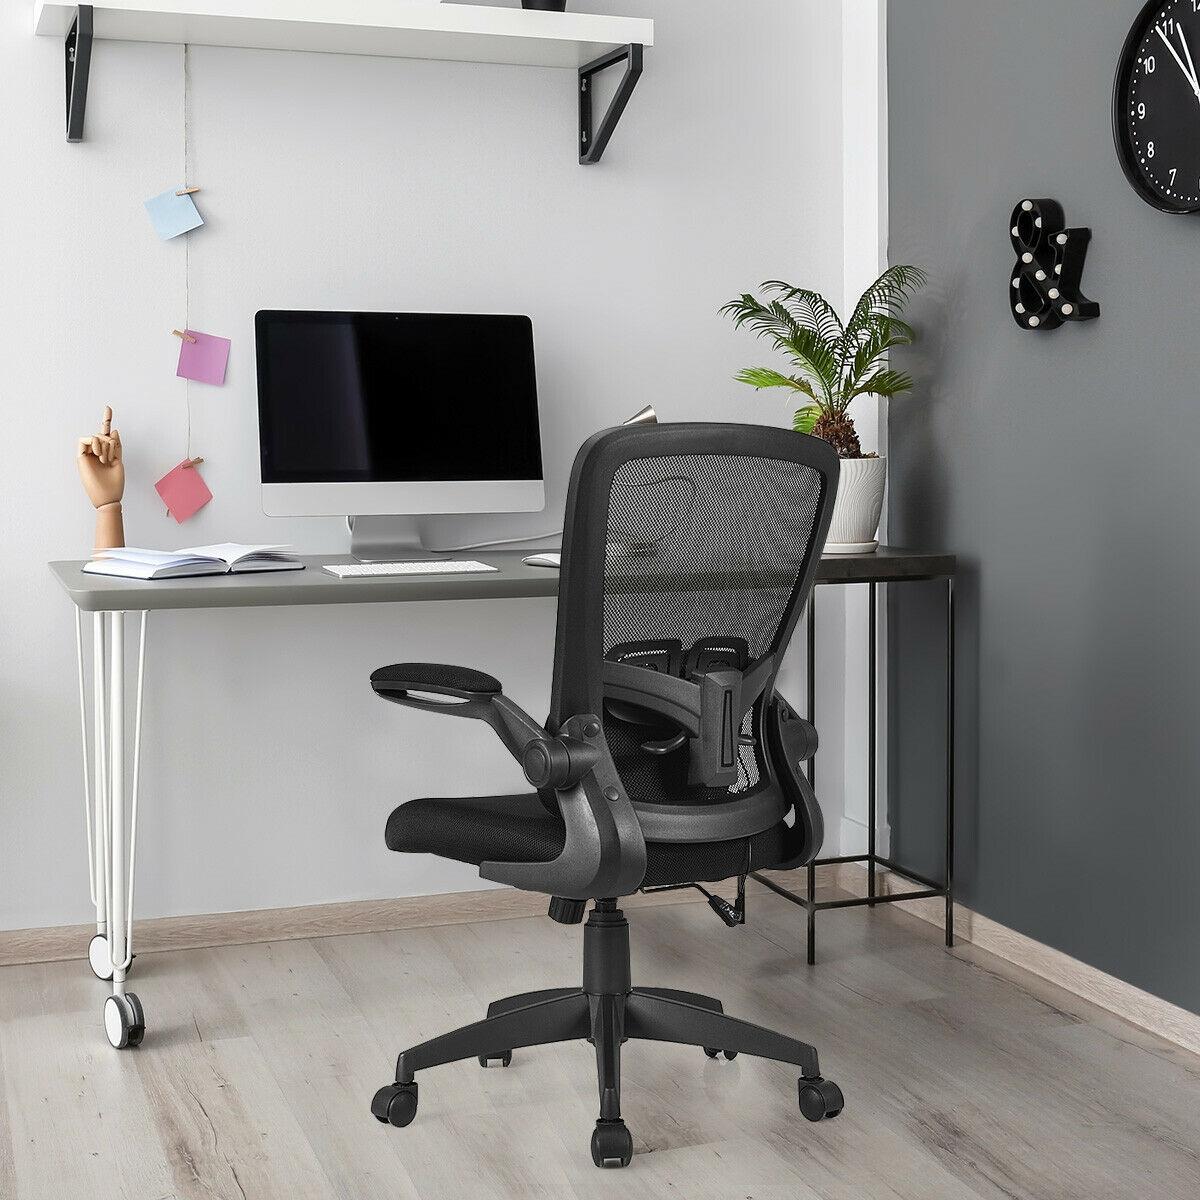 Image of Ergonomic Desk Chair with Flip up Armrest